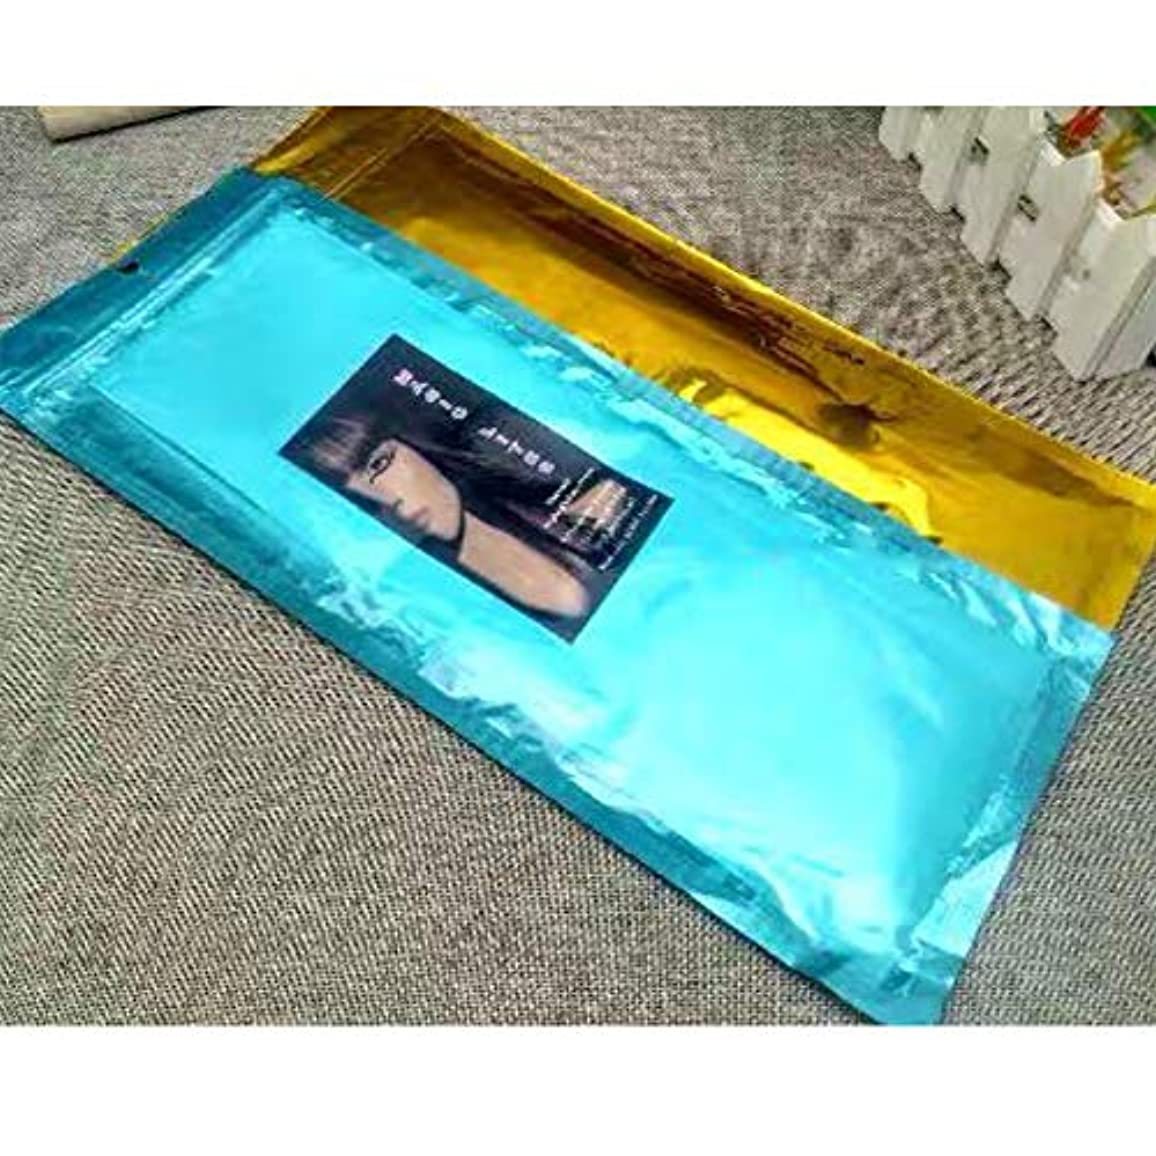 ACHICOO 100ピースプロサロン染毛紙再生利用できる分離染色染色理髪店ハイライトティッシュ美容院サロンツール